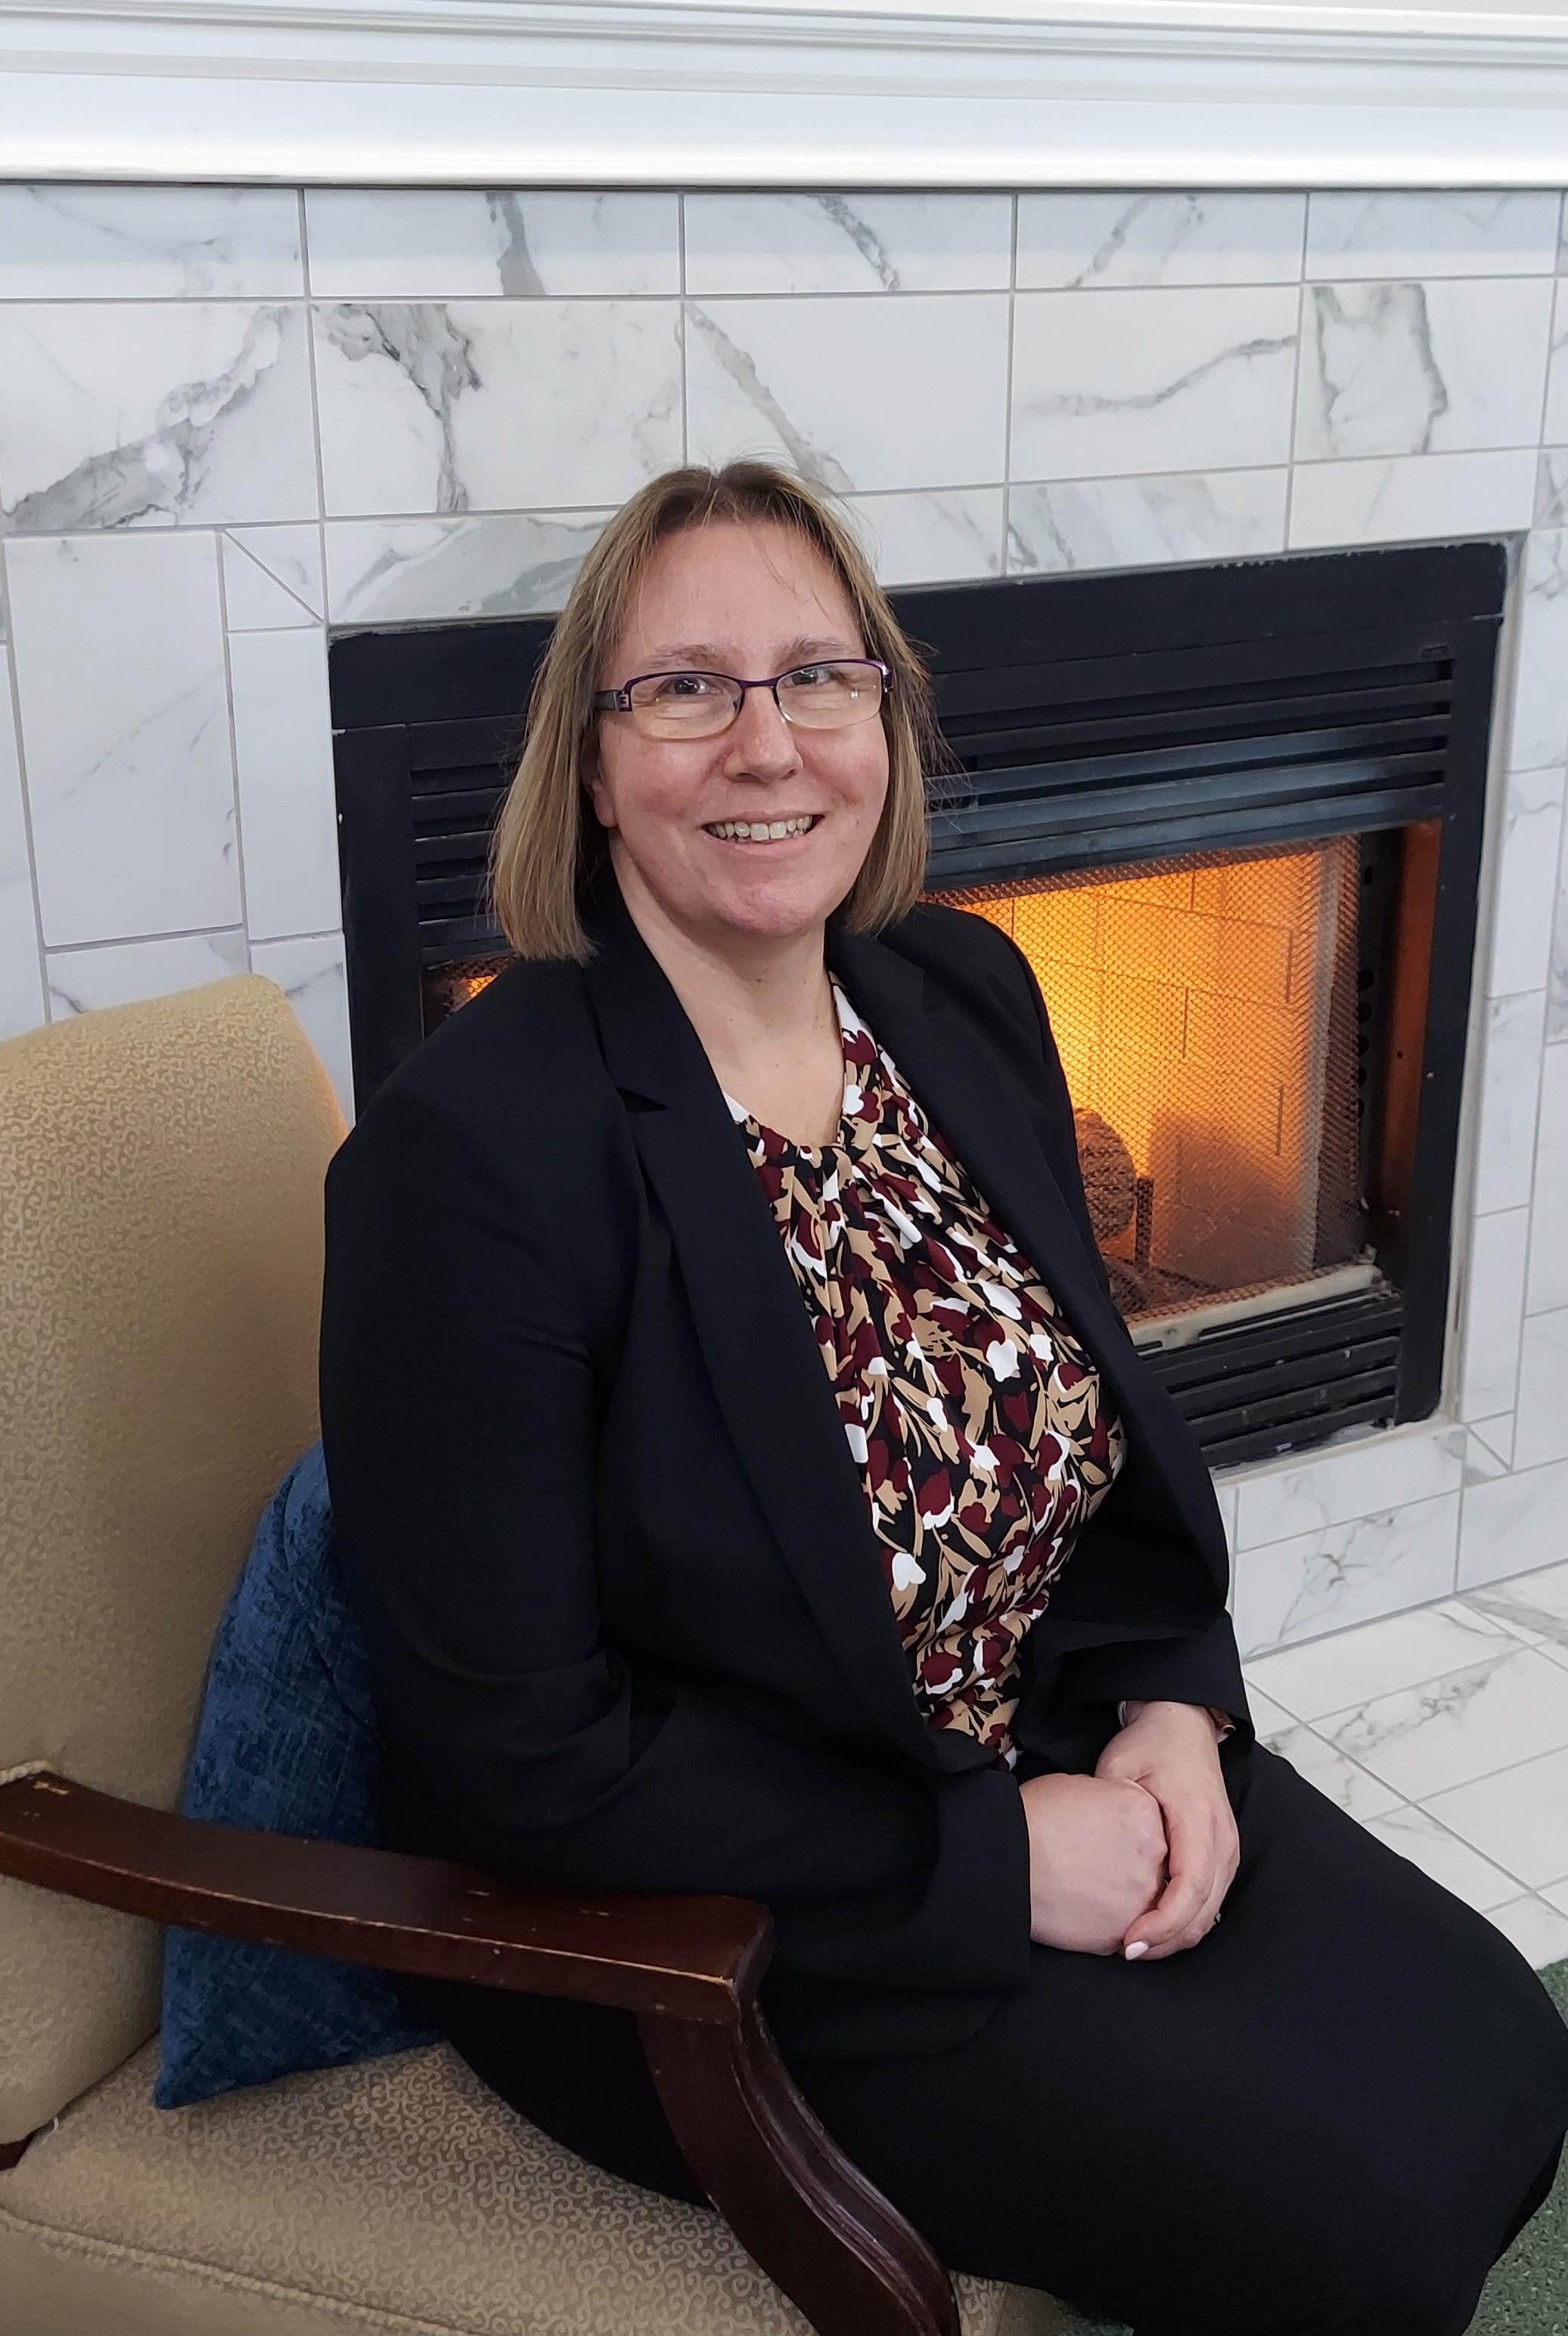 Susan Todd, Administrator at Lassen House Senior Living in Red Bluff, California